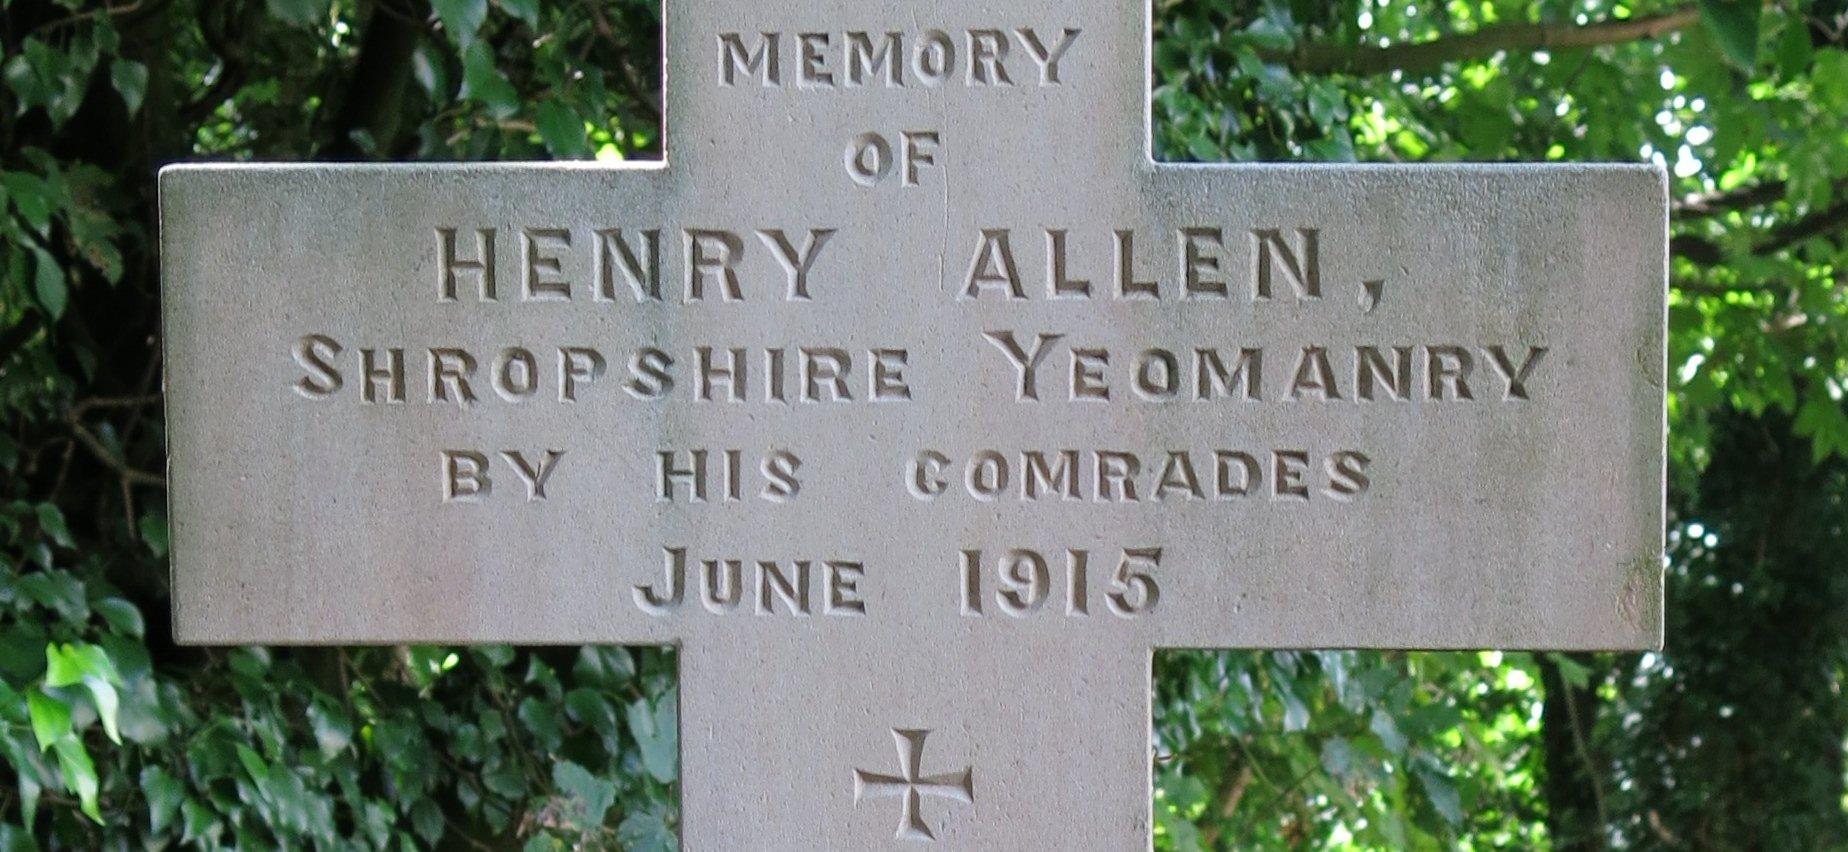 Private Henry Allen